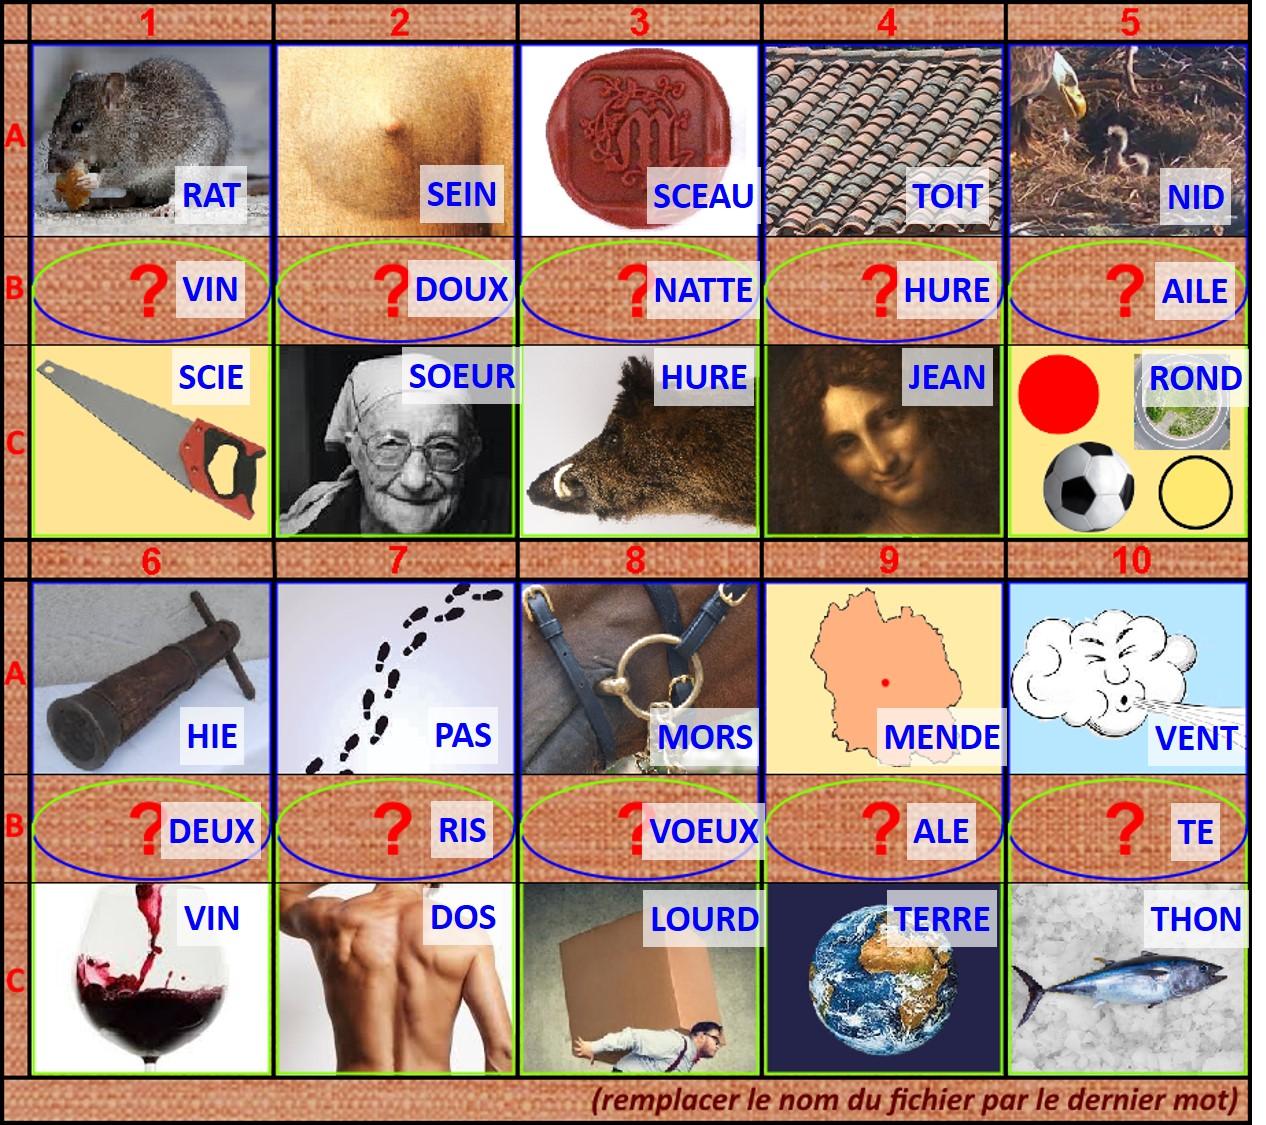 http://www.prise2tete.fr/upload/Klimrod-Jackv_Gastronomie.jpg